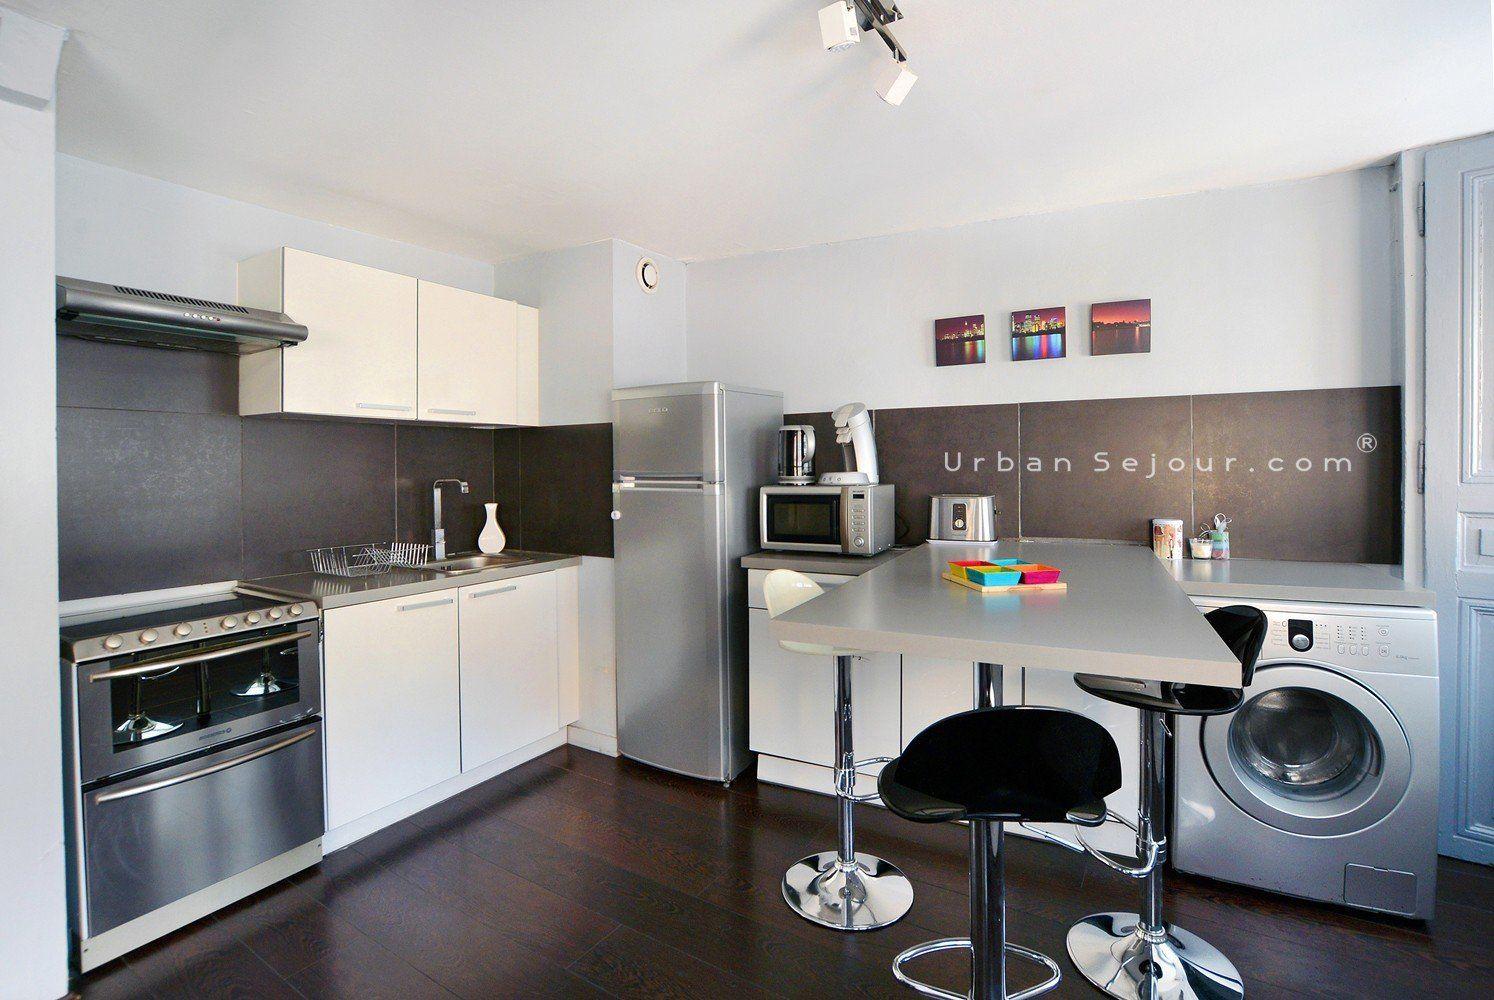 Location appartement meubl avec 1 chambre location for Location studio meuble lyon